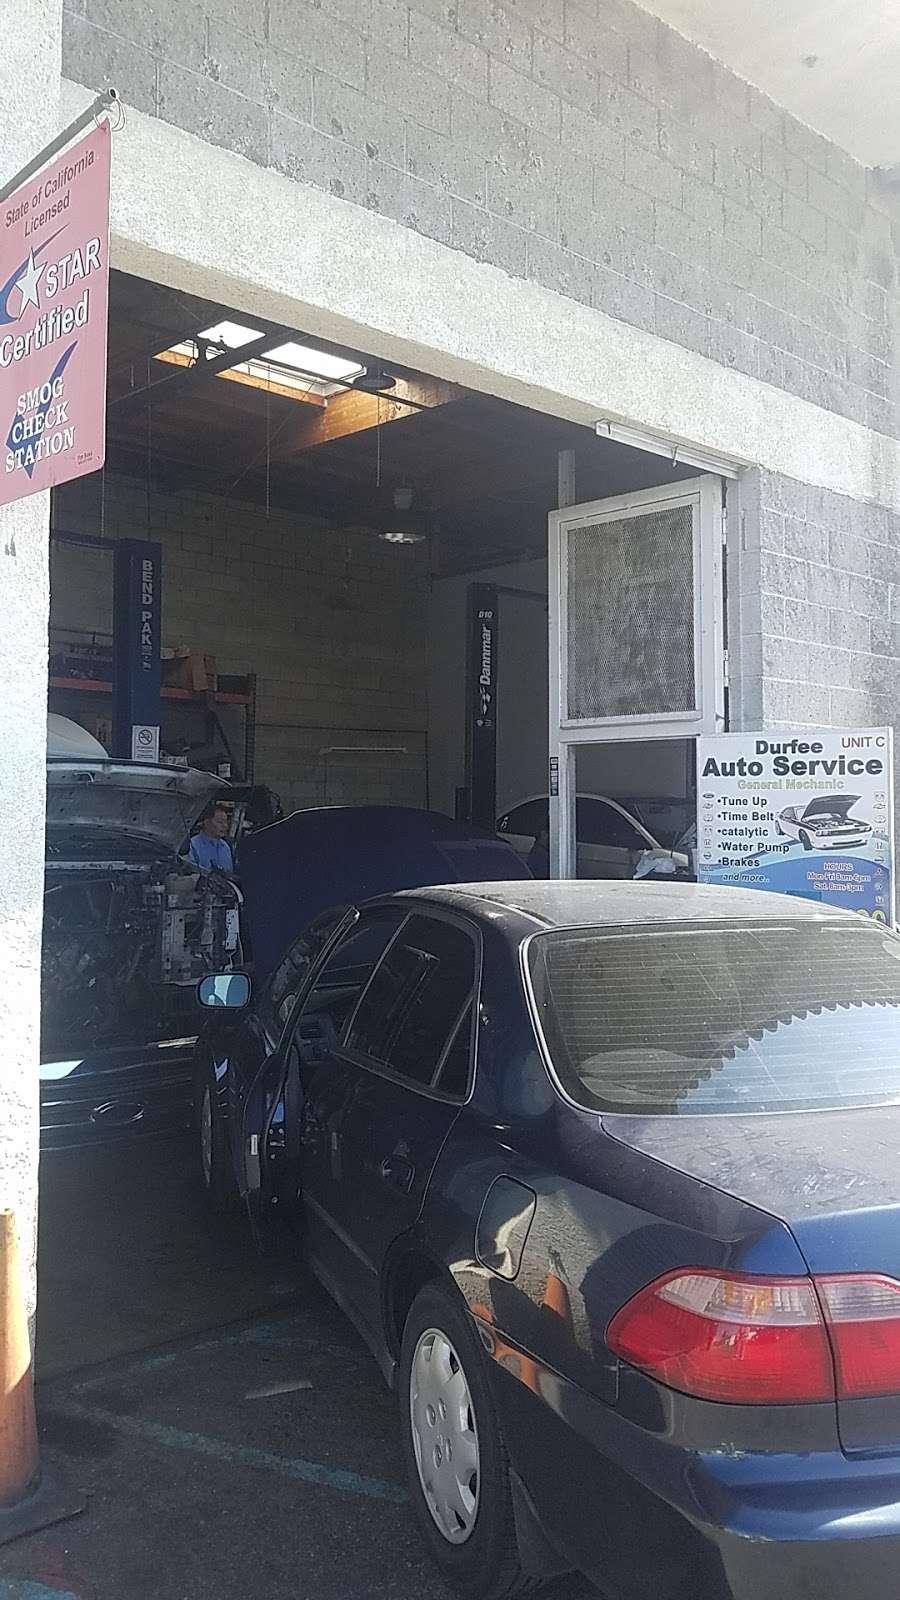 Durfee Auto Service - car repair  | Photo 7 of 8 | Address: 2406 Durfee Ave, El Monte, CA 91732, USA | Phone: (626) 443-8590